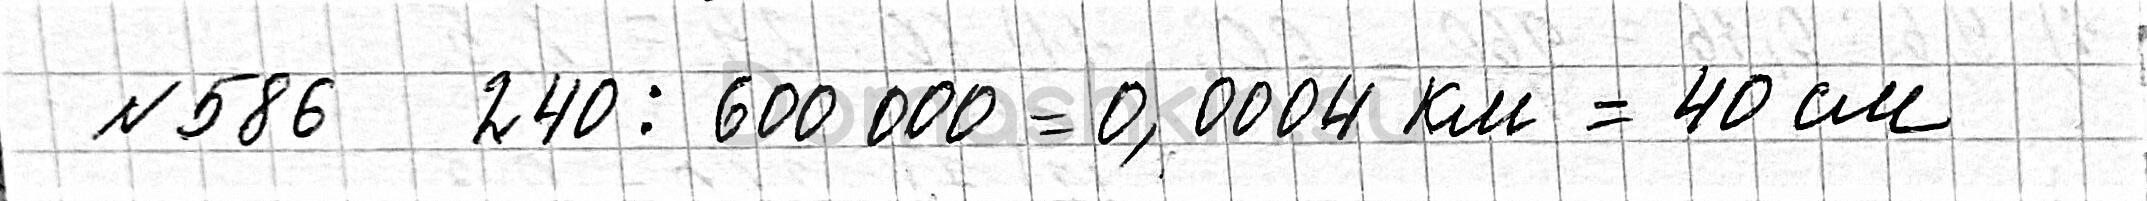 Математика 6 класс учебник Мерзляк номер 586 решение